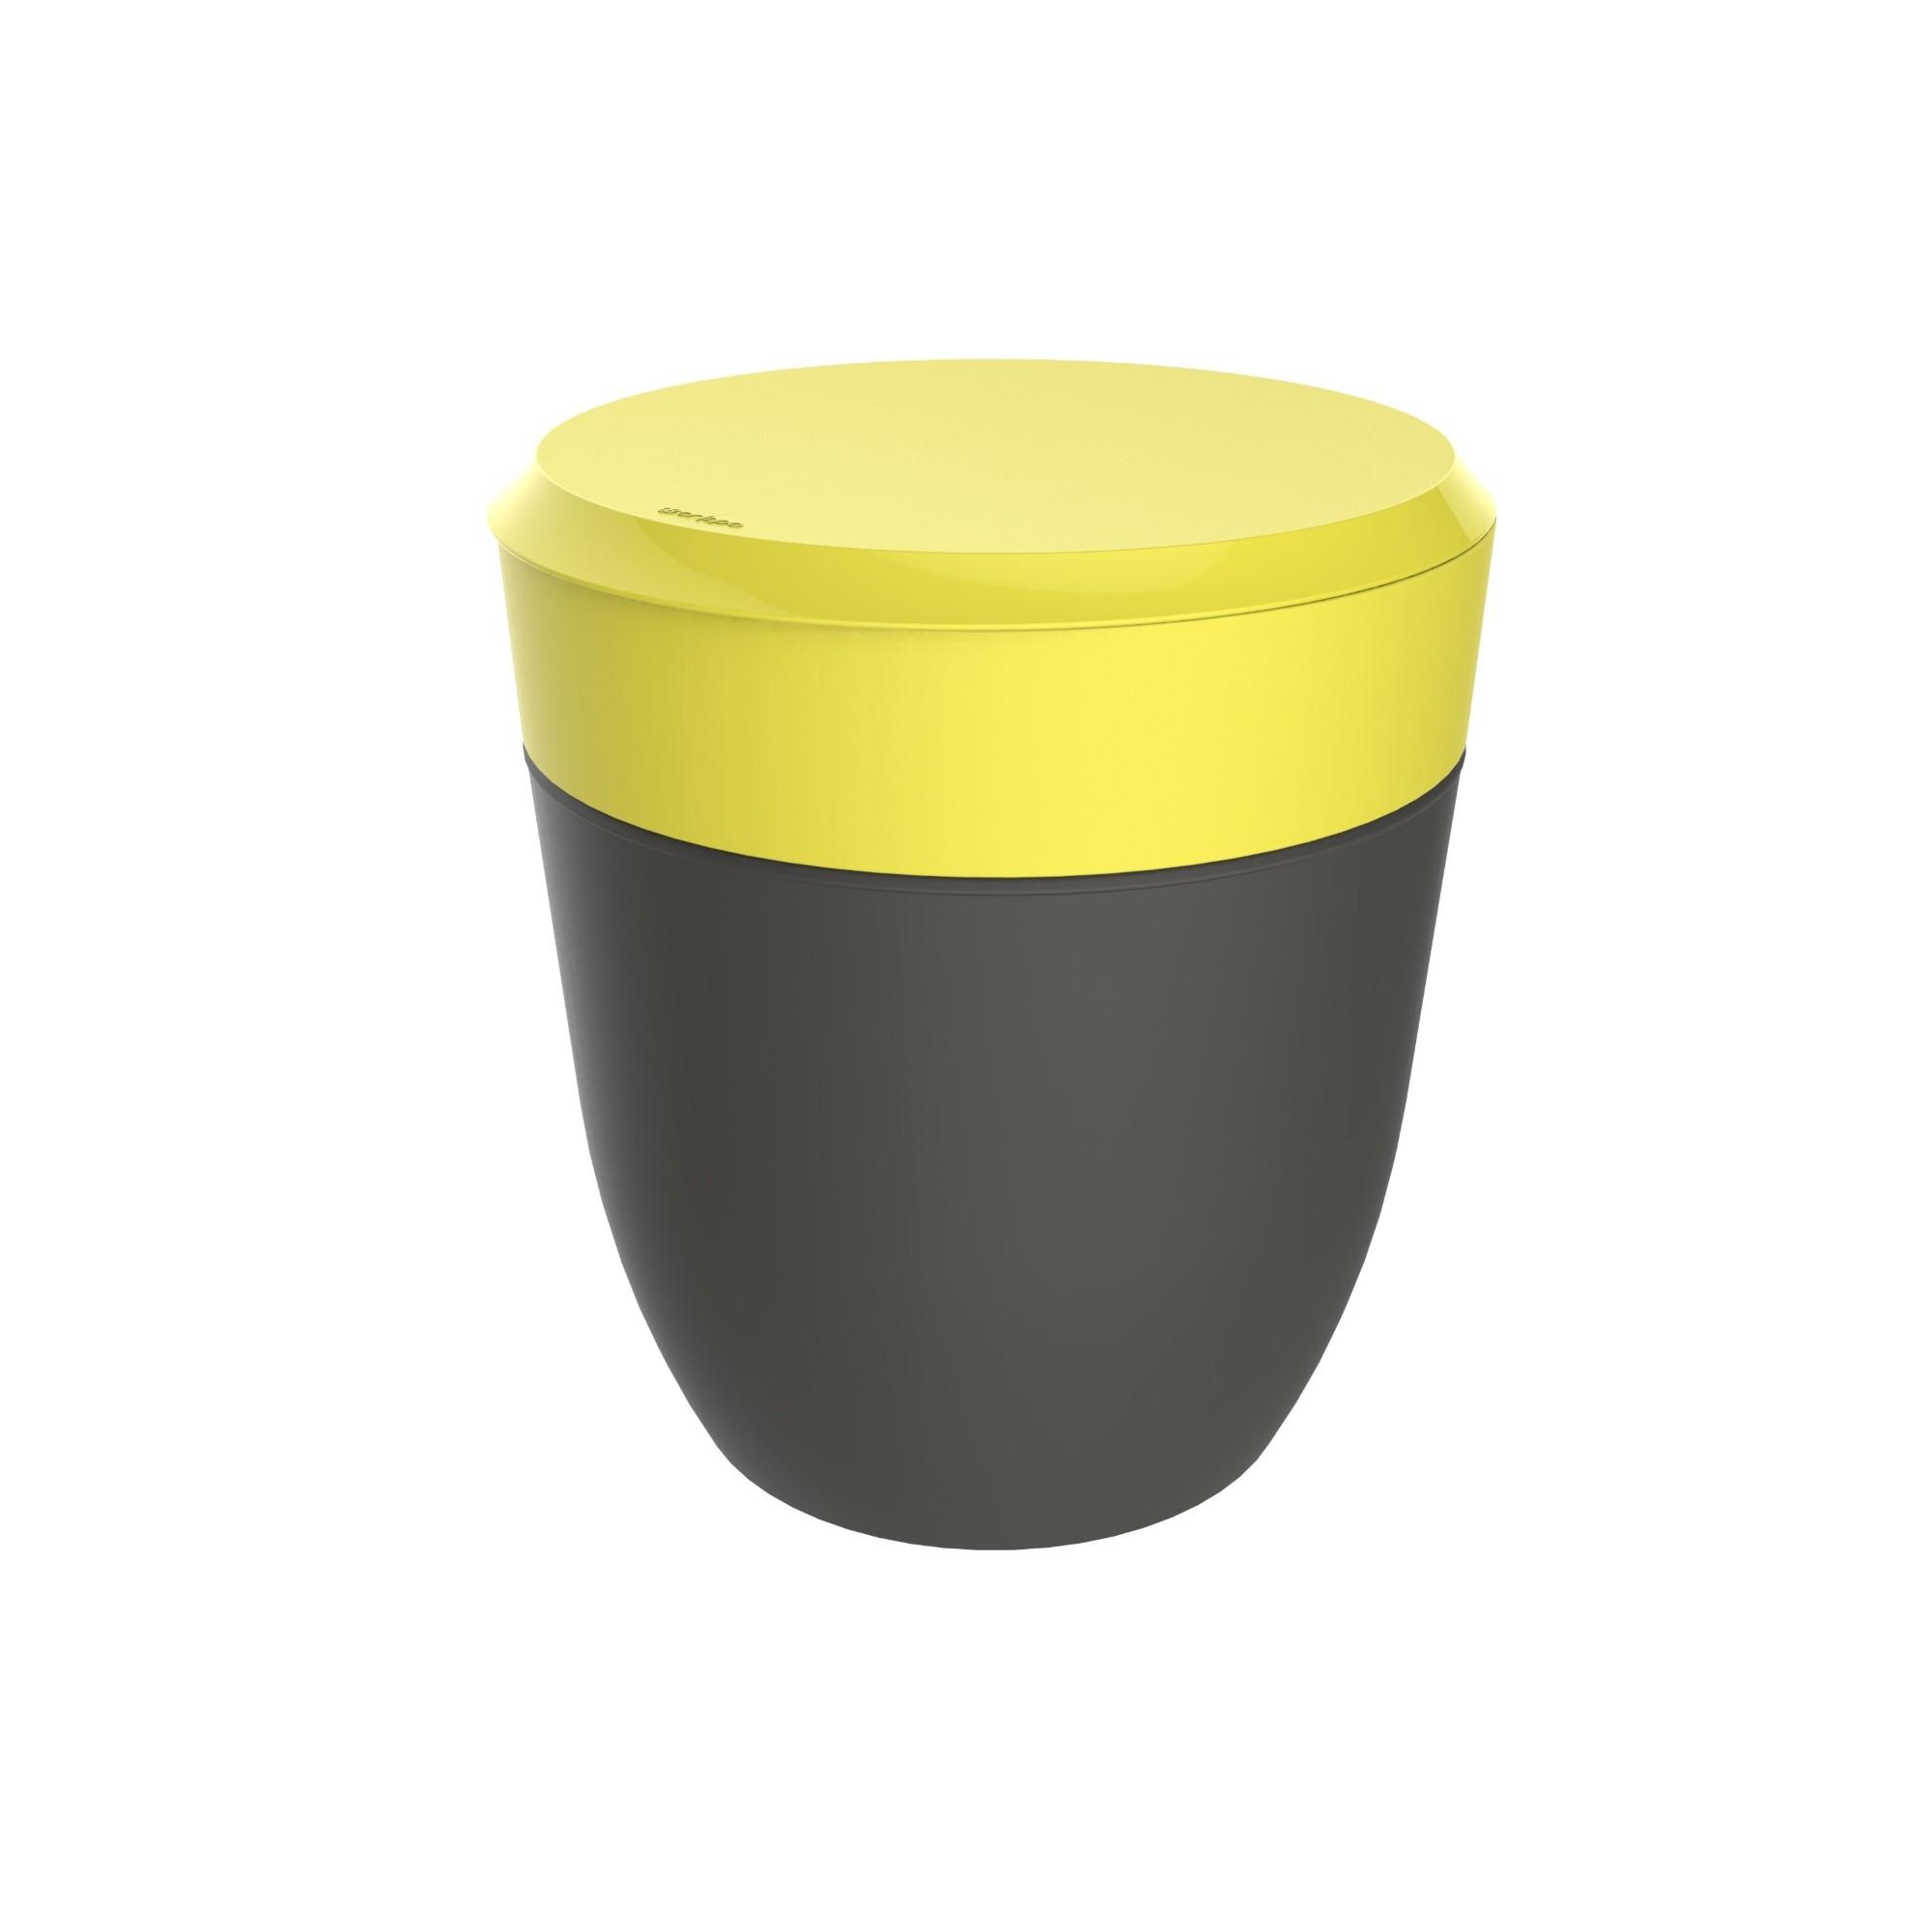 Lixeira com Tampa Manual Redondo Plastico 25L Amarelo 40703056 - Crippa